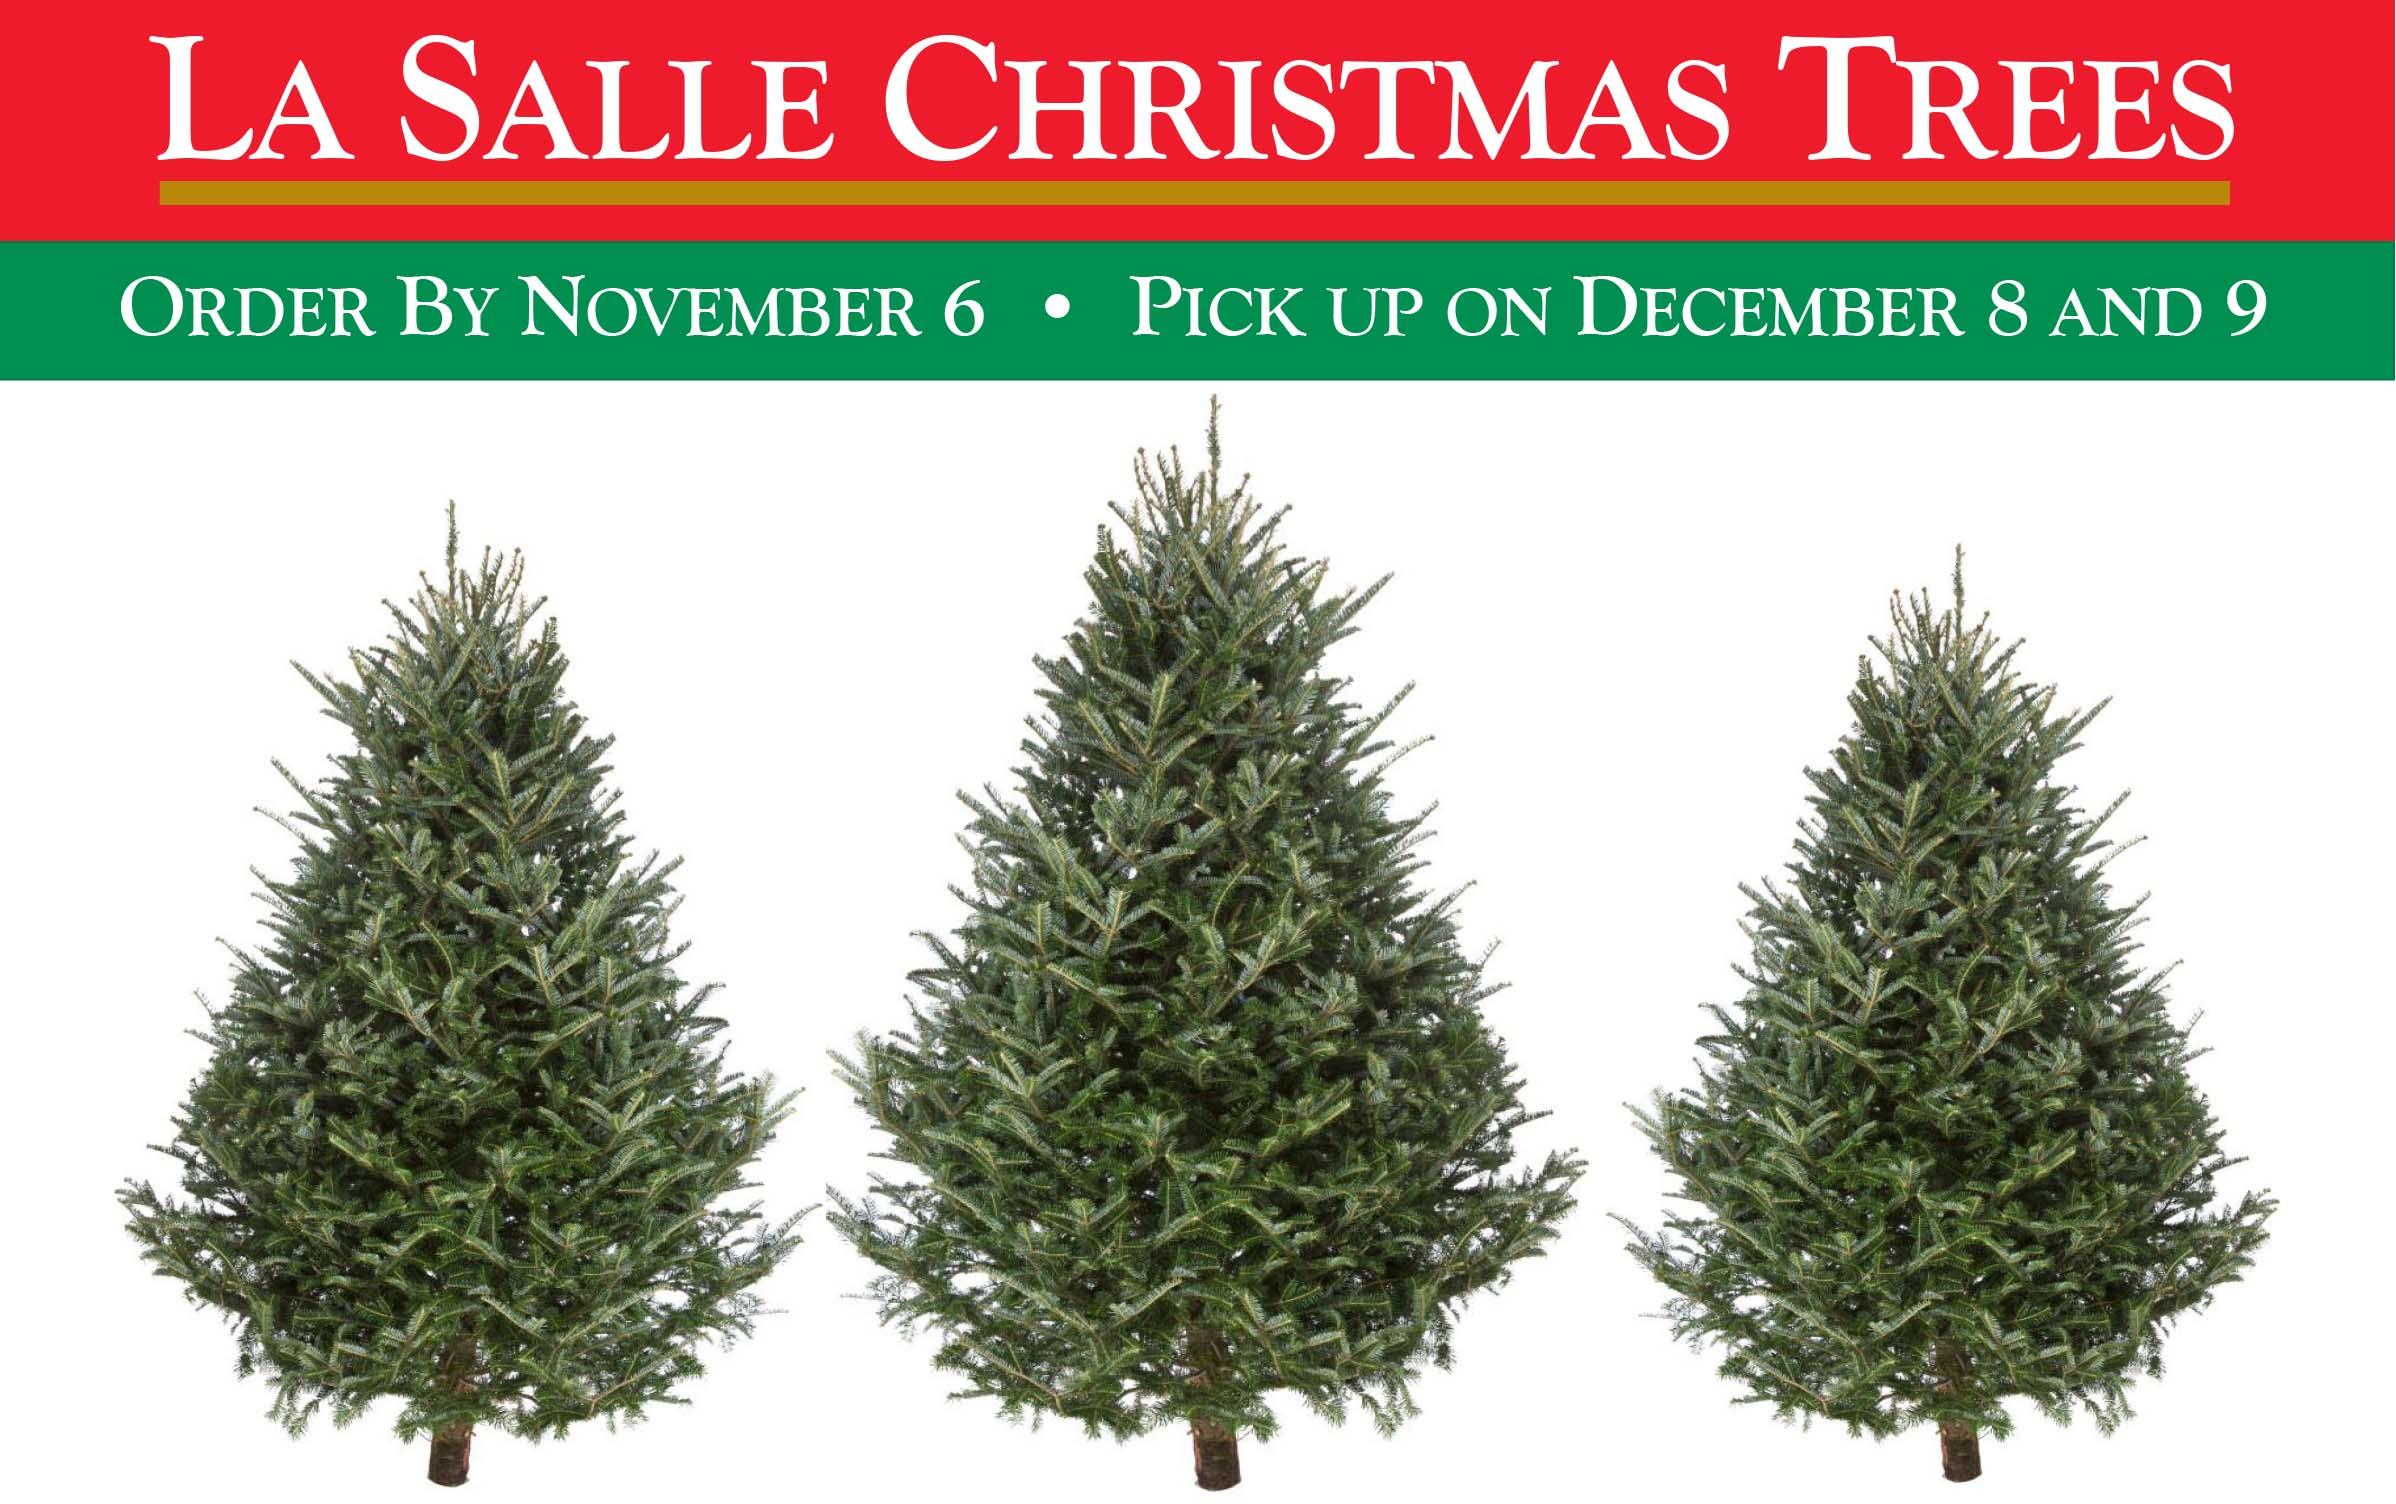 8th annual student life christmas tree sale - Christmas Tree For Sale